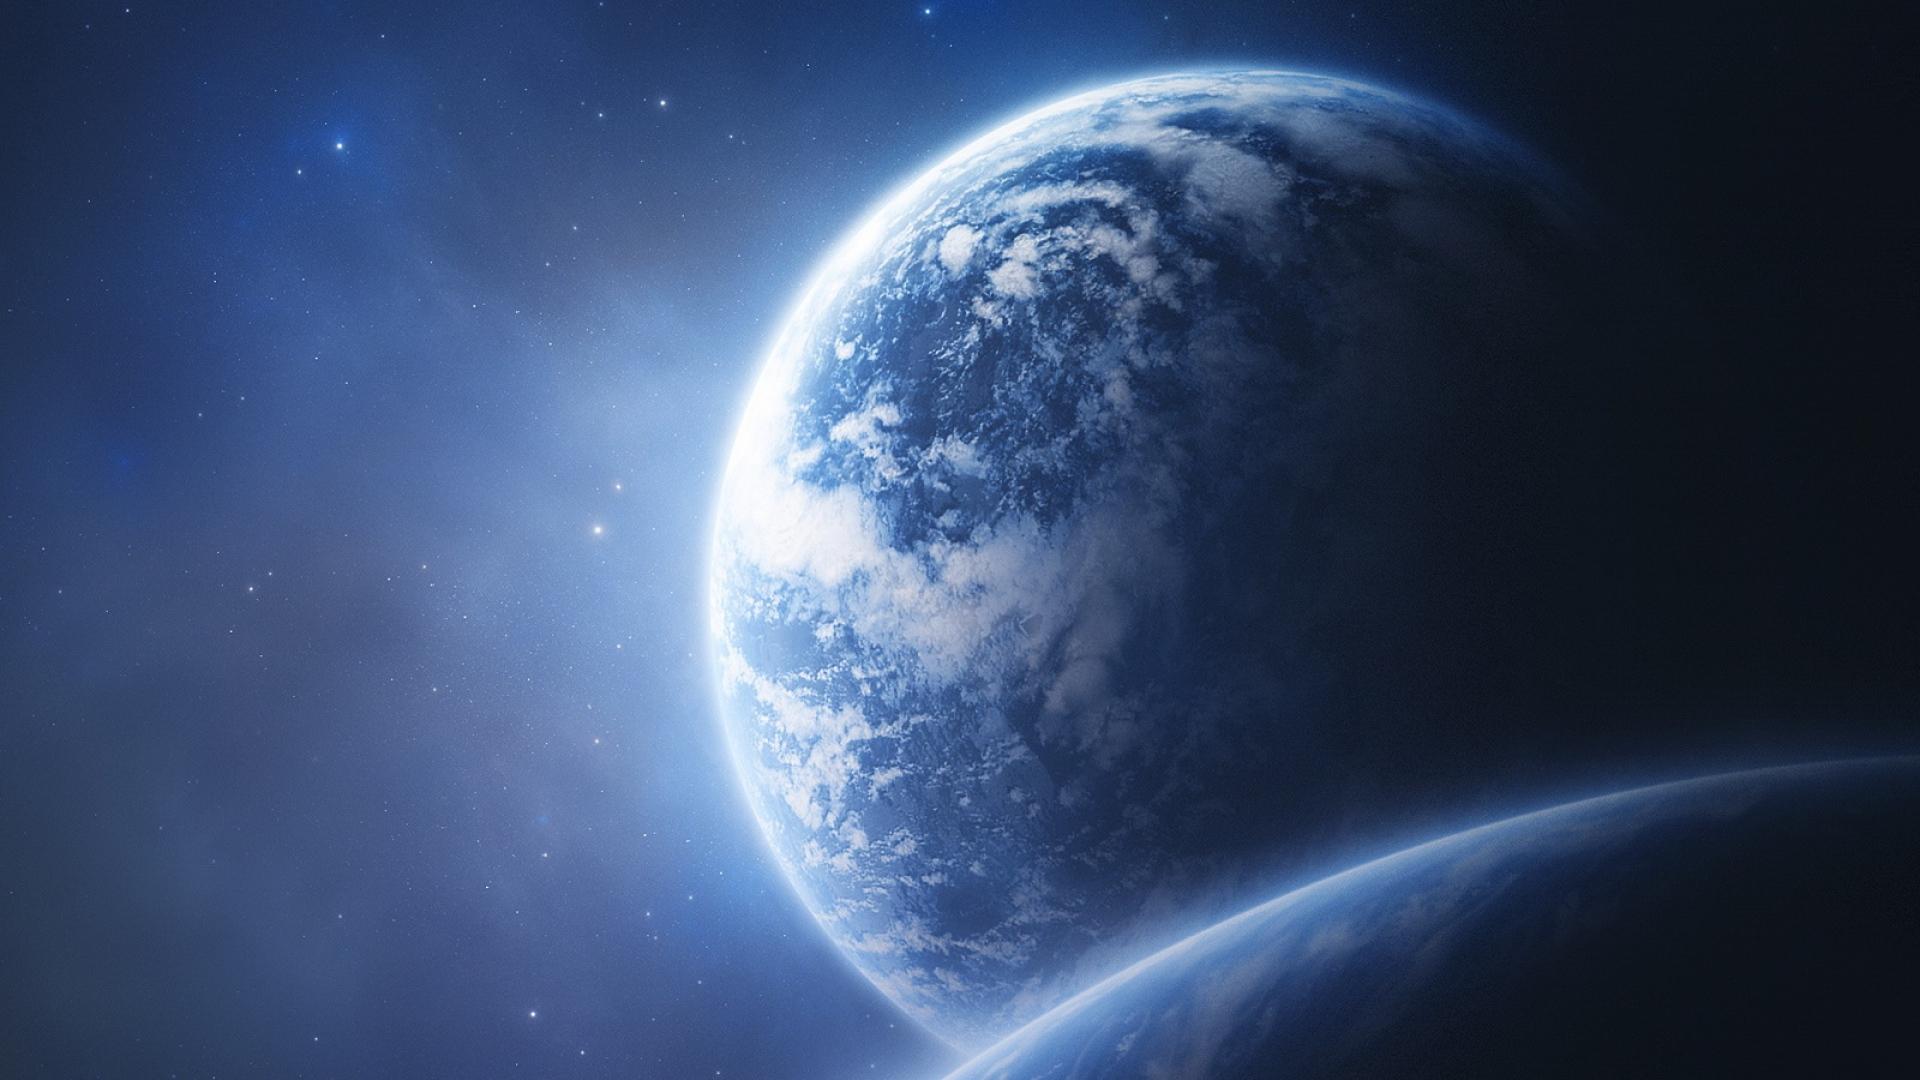 Download Wallpaper 1920x1080 earth, planet, orbit, picture ...